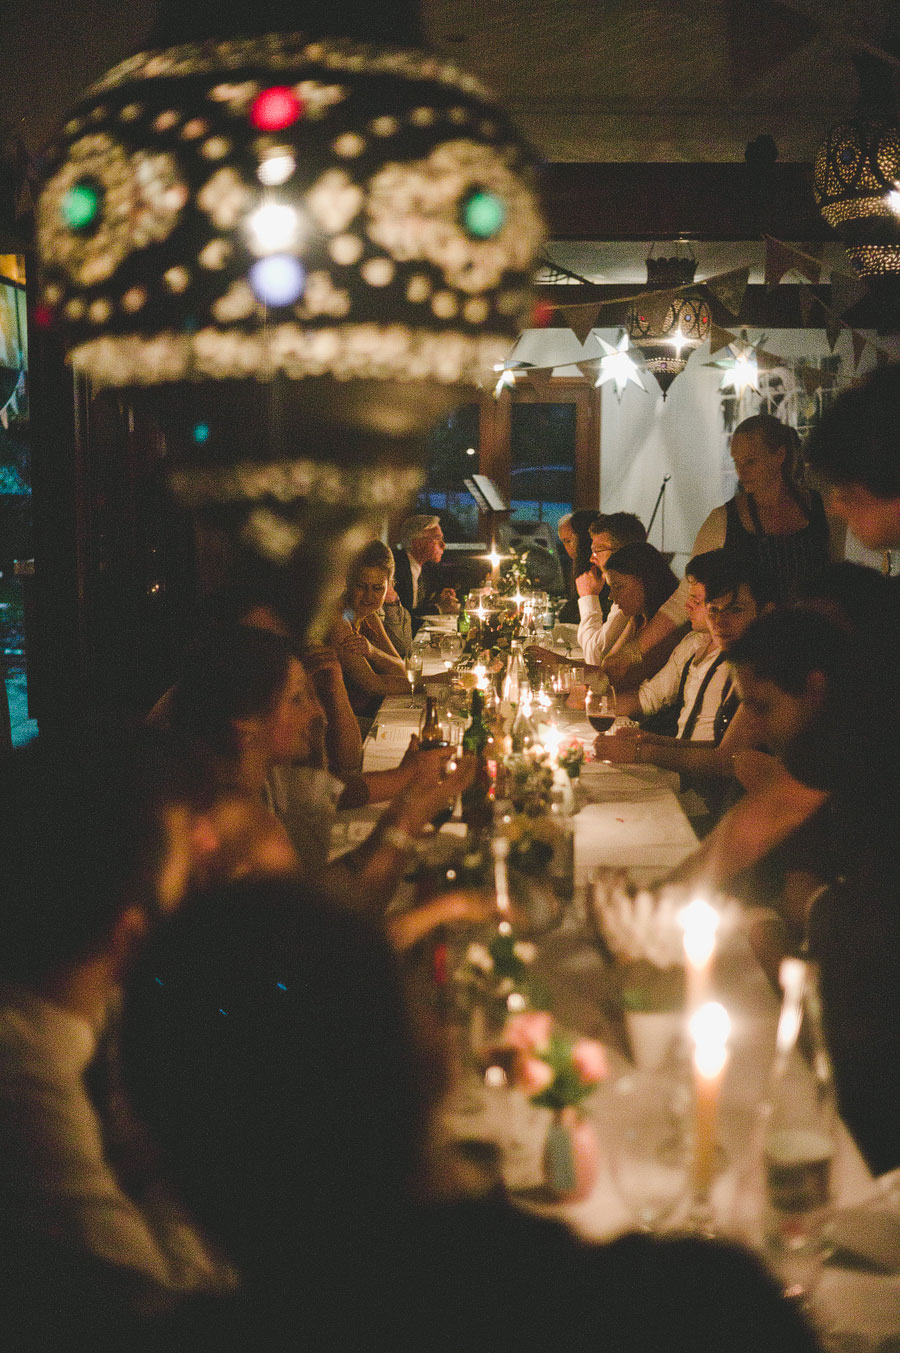 Dinner arrangements - Babalu bar - Lorne